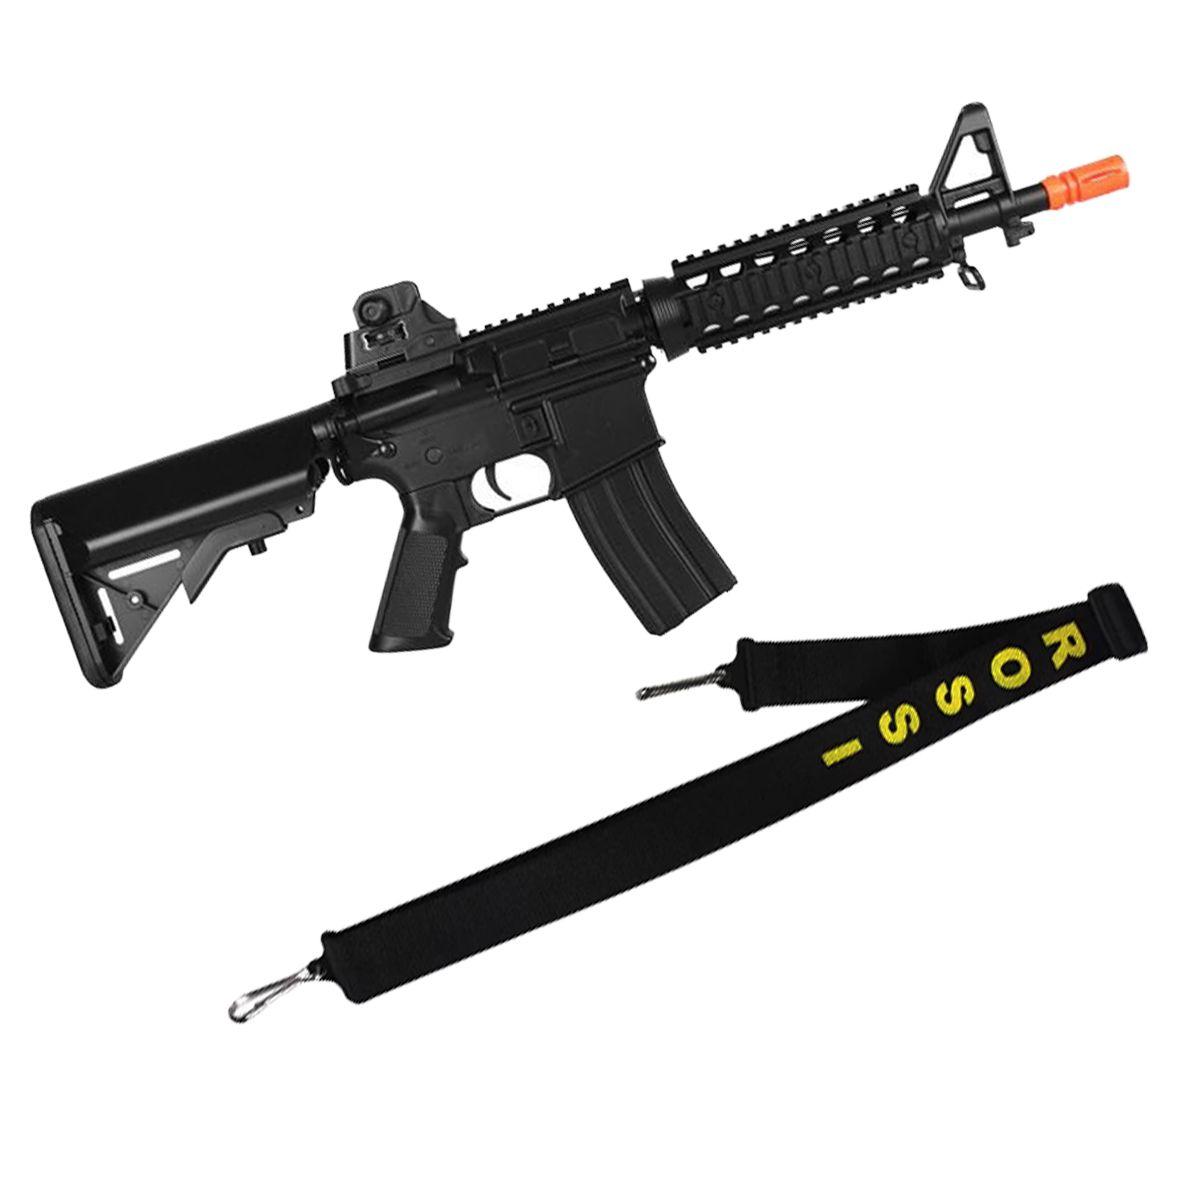 Rifle Airsoft Elétrico Cyma M4 Cqb Ris CM506 Bivolt + Bandoleira